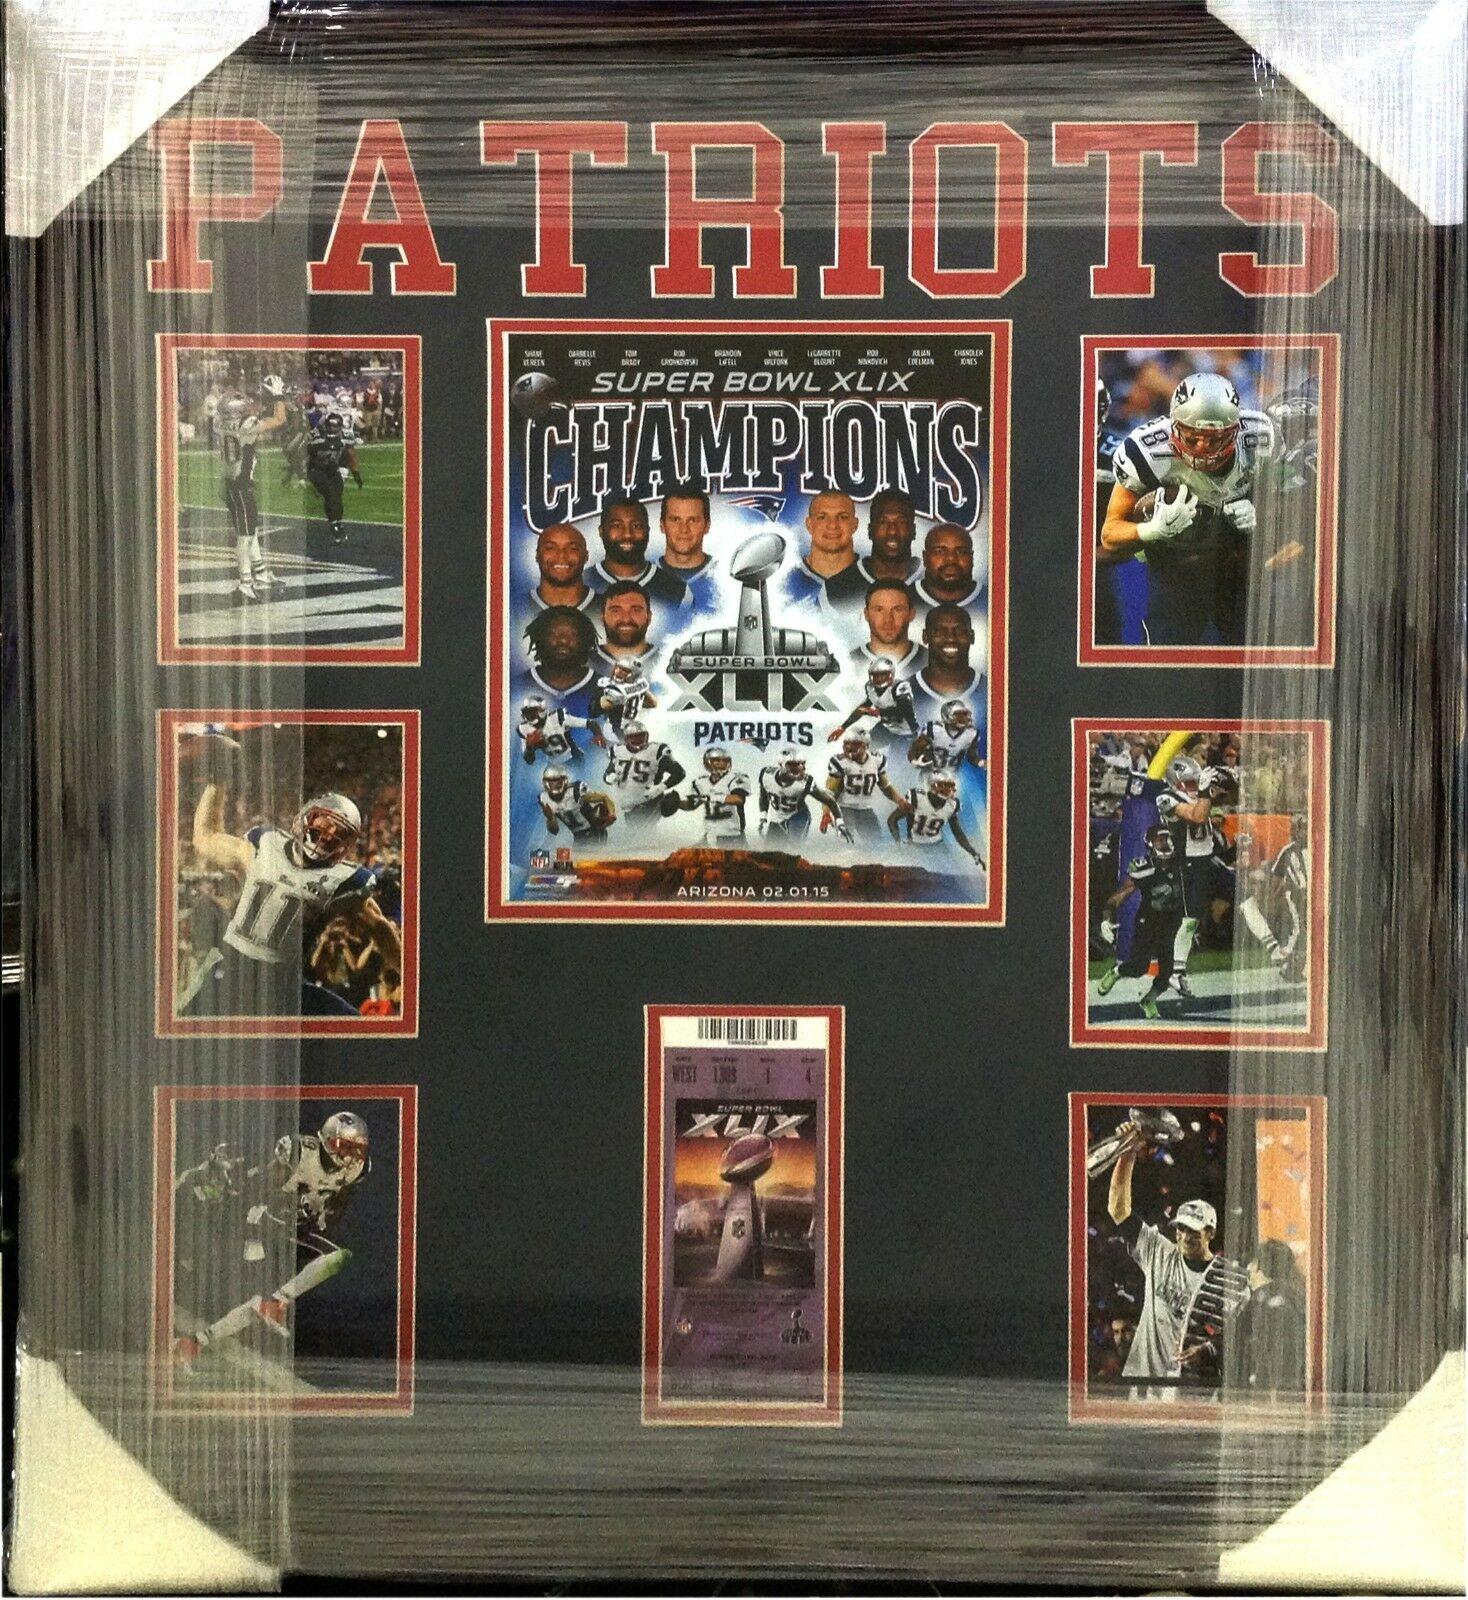 New England Patriots Super Bowl XLIX Champions Photo Collage Custom Framed 22×26